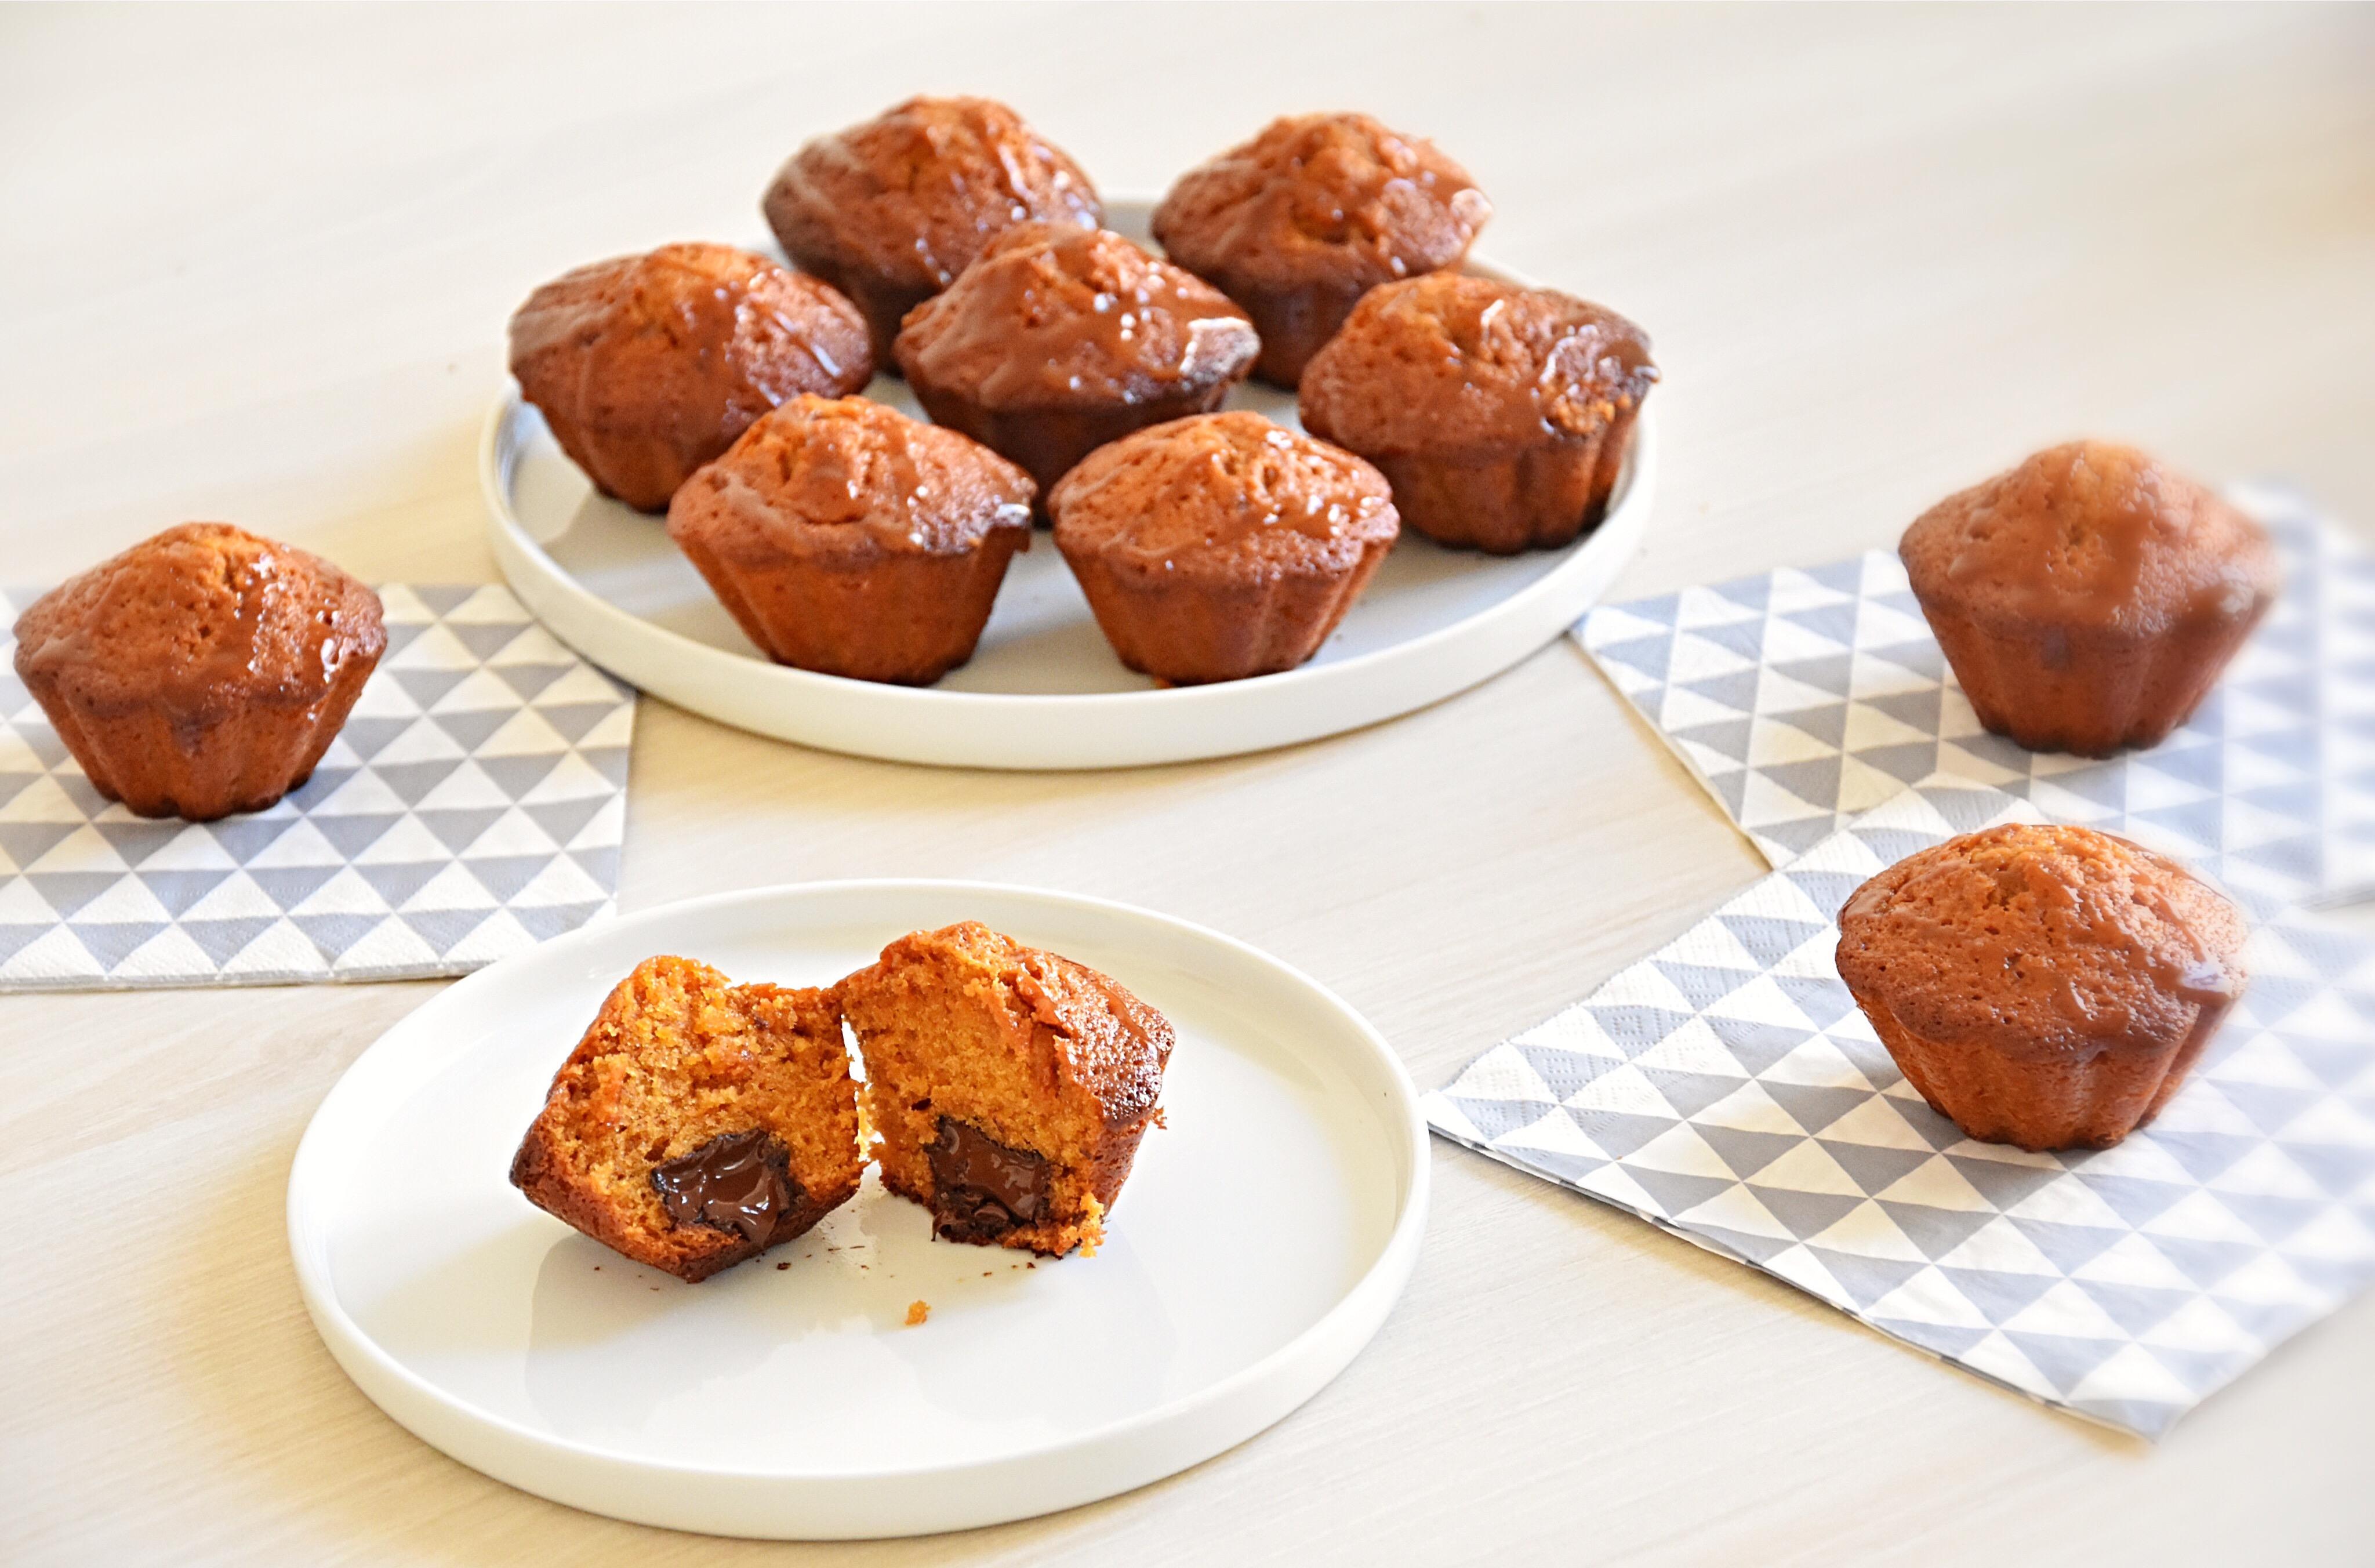 Muffins caramel beurre salé, coeur coulant chocolat